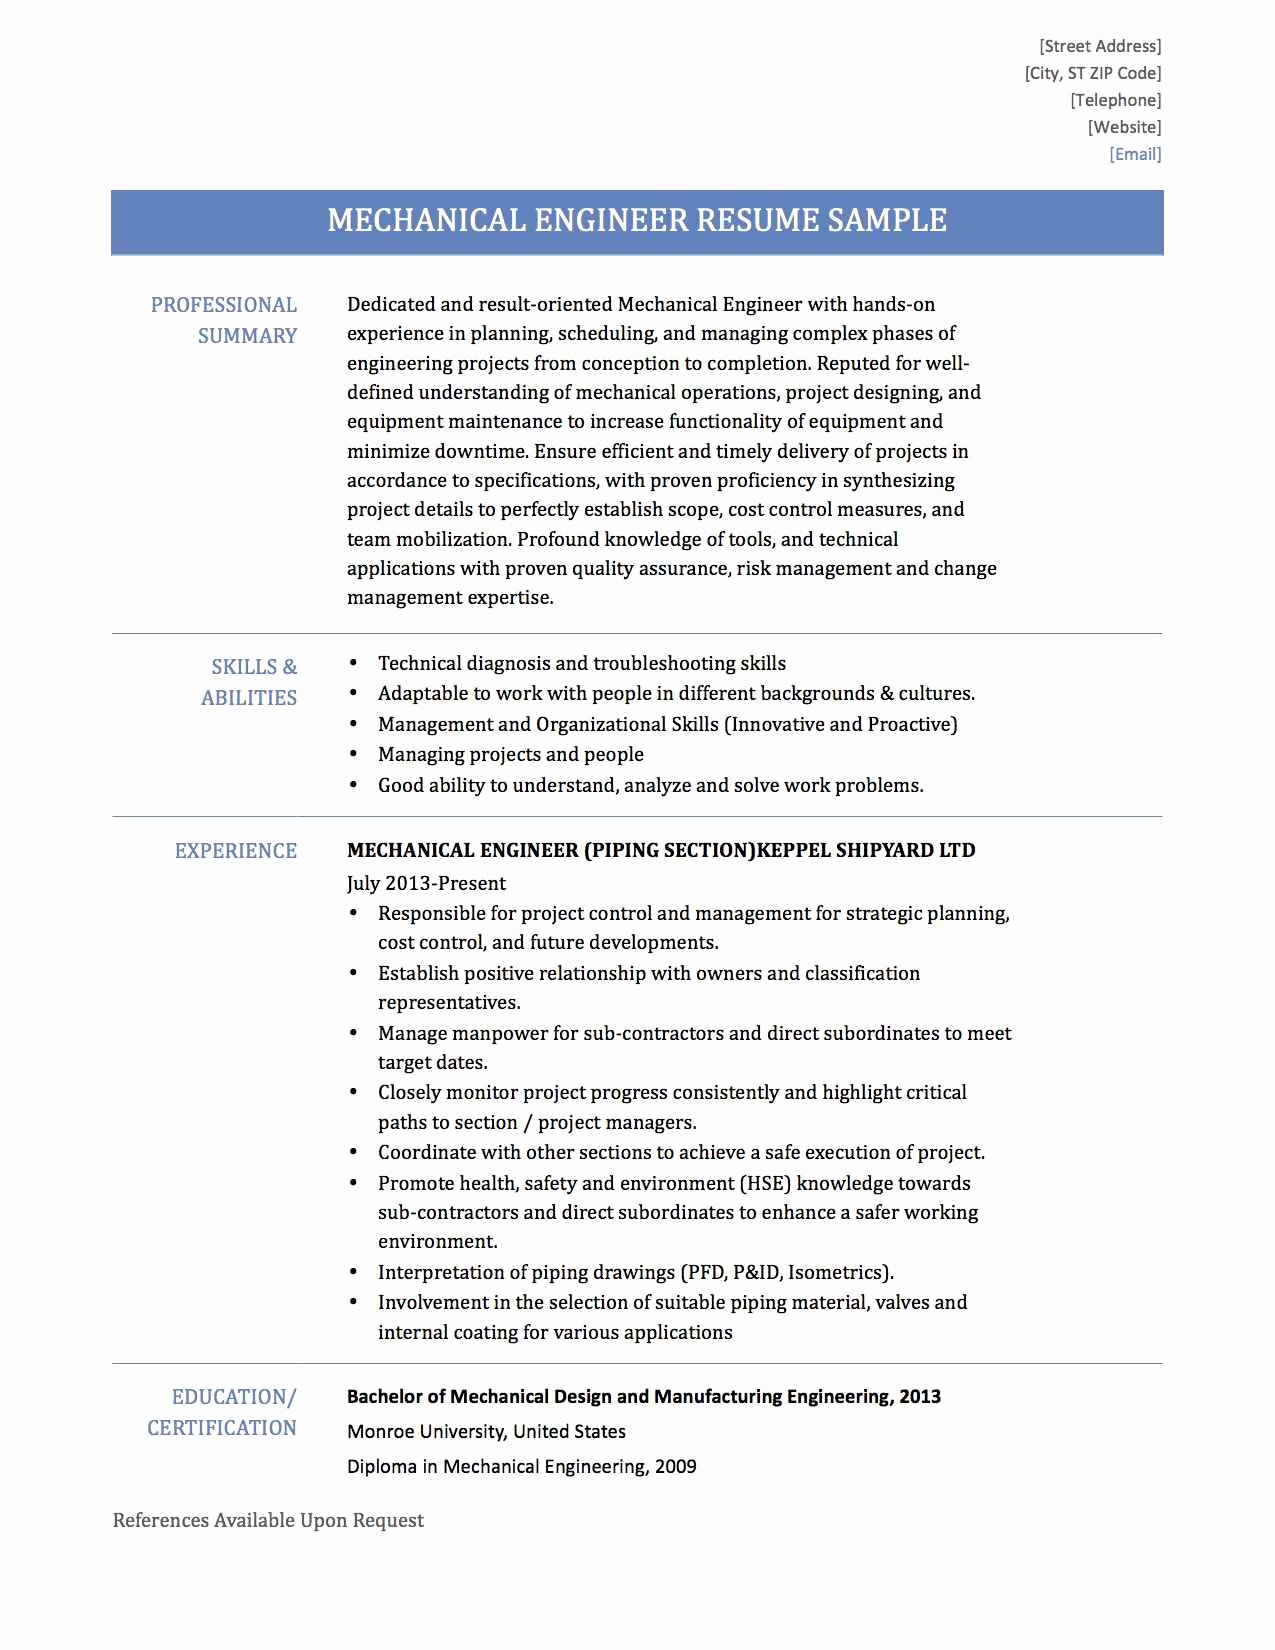 Sample Resume for Mechanical Engineer Experienced Pdf